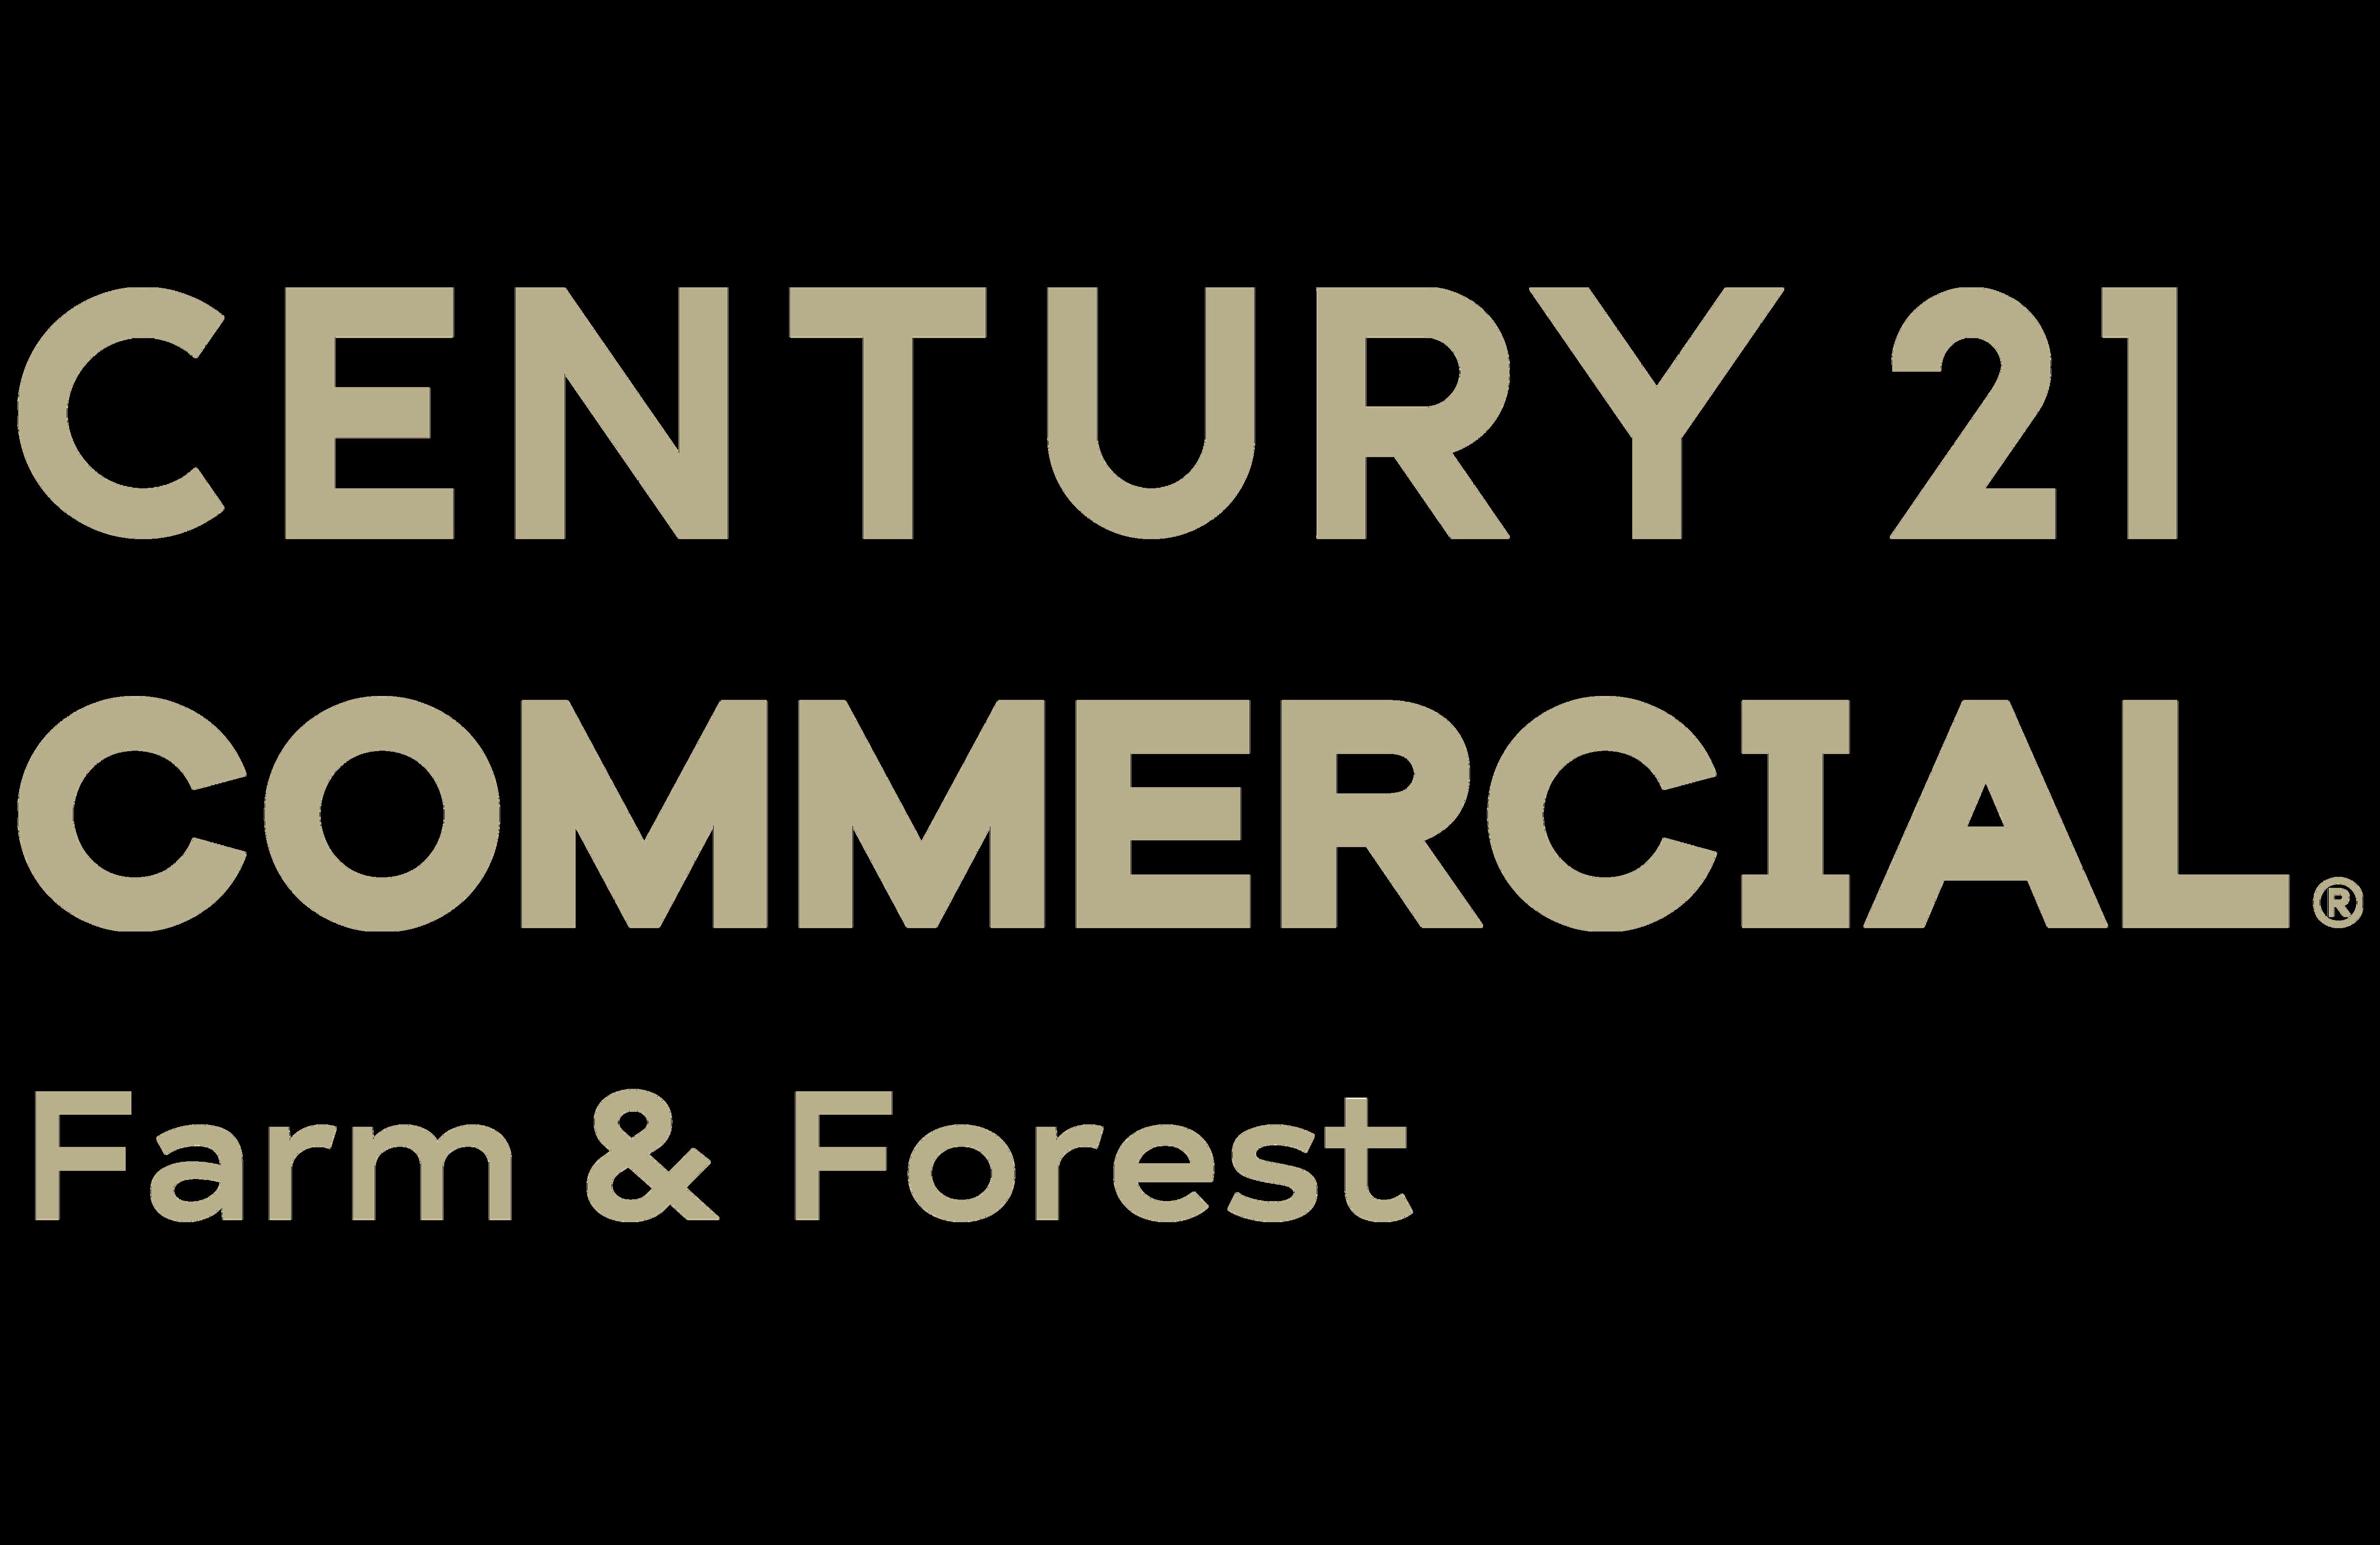 CENTURY 21 Farm & Forest